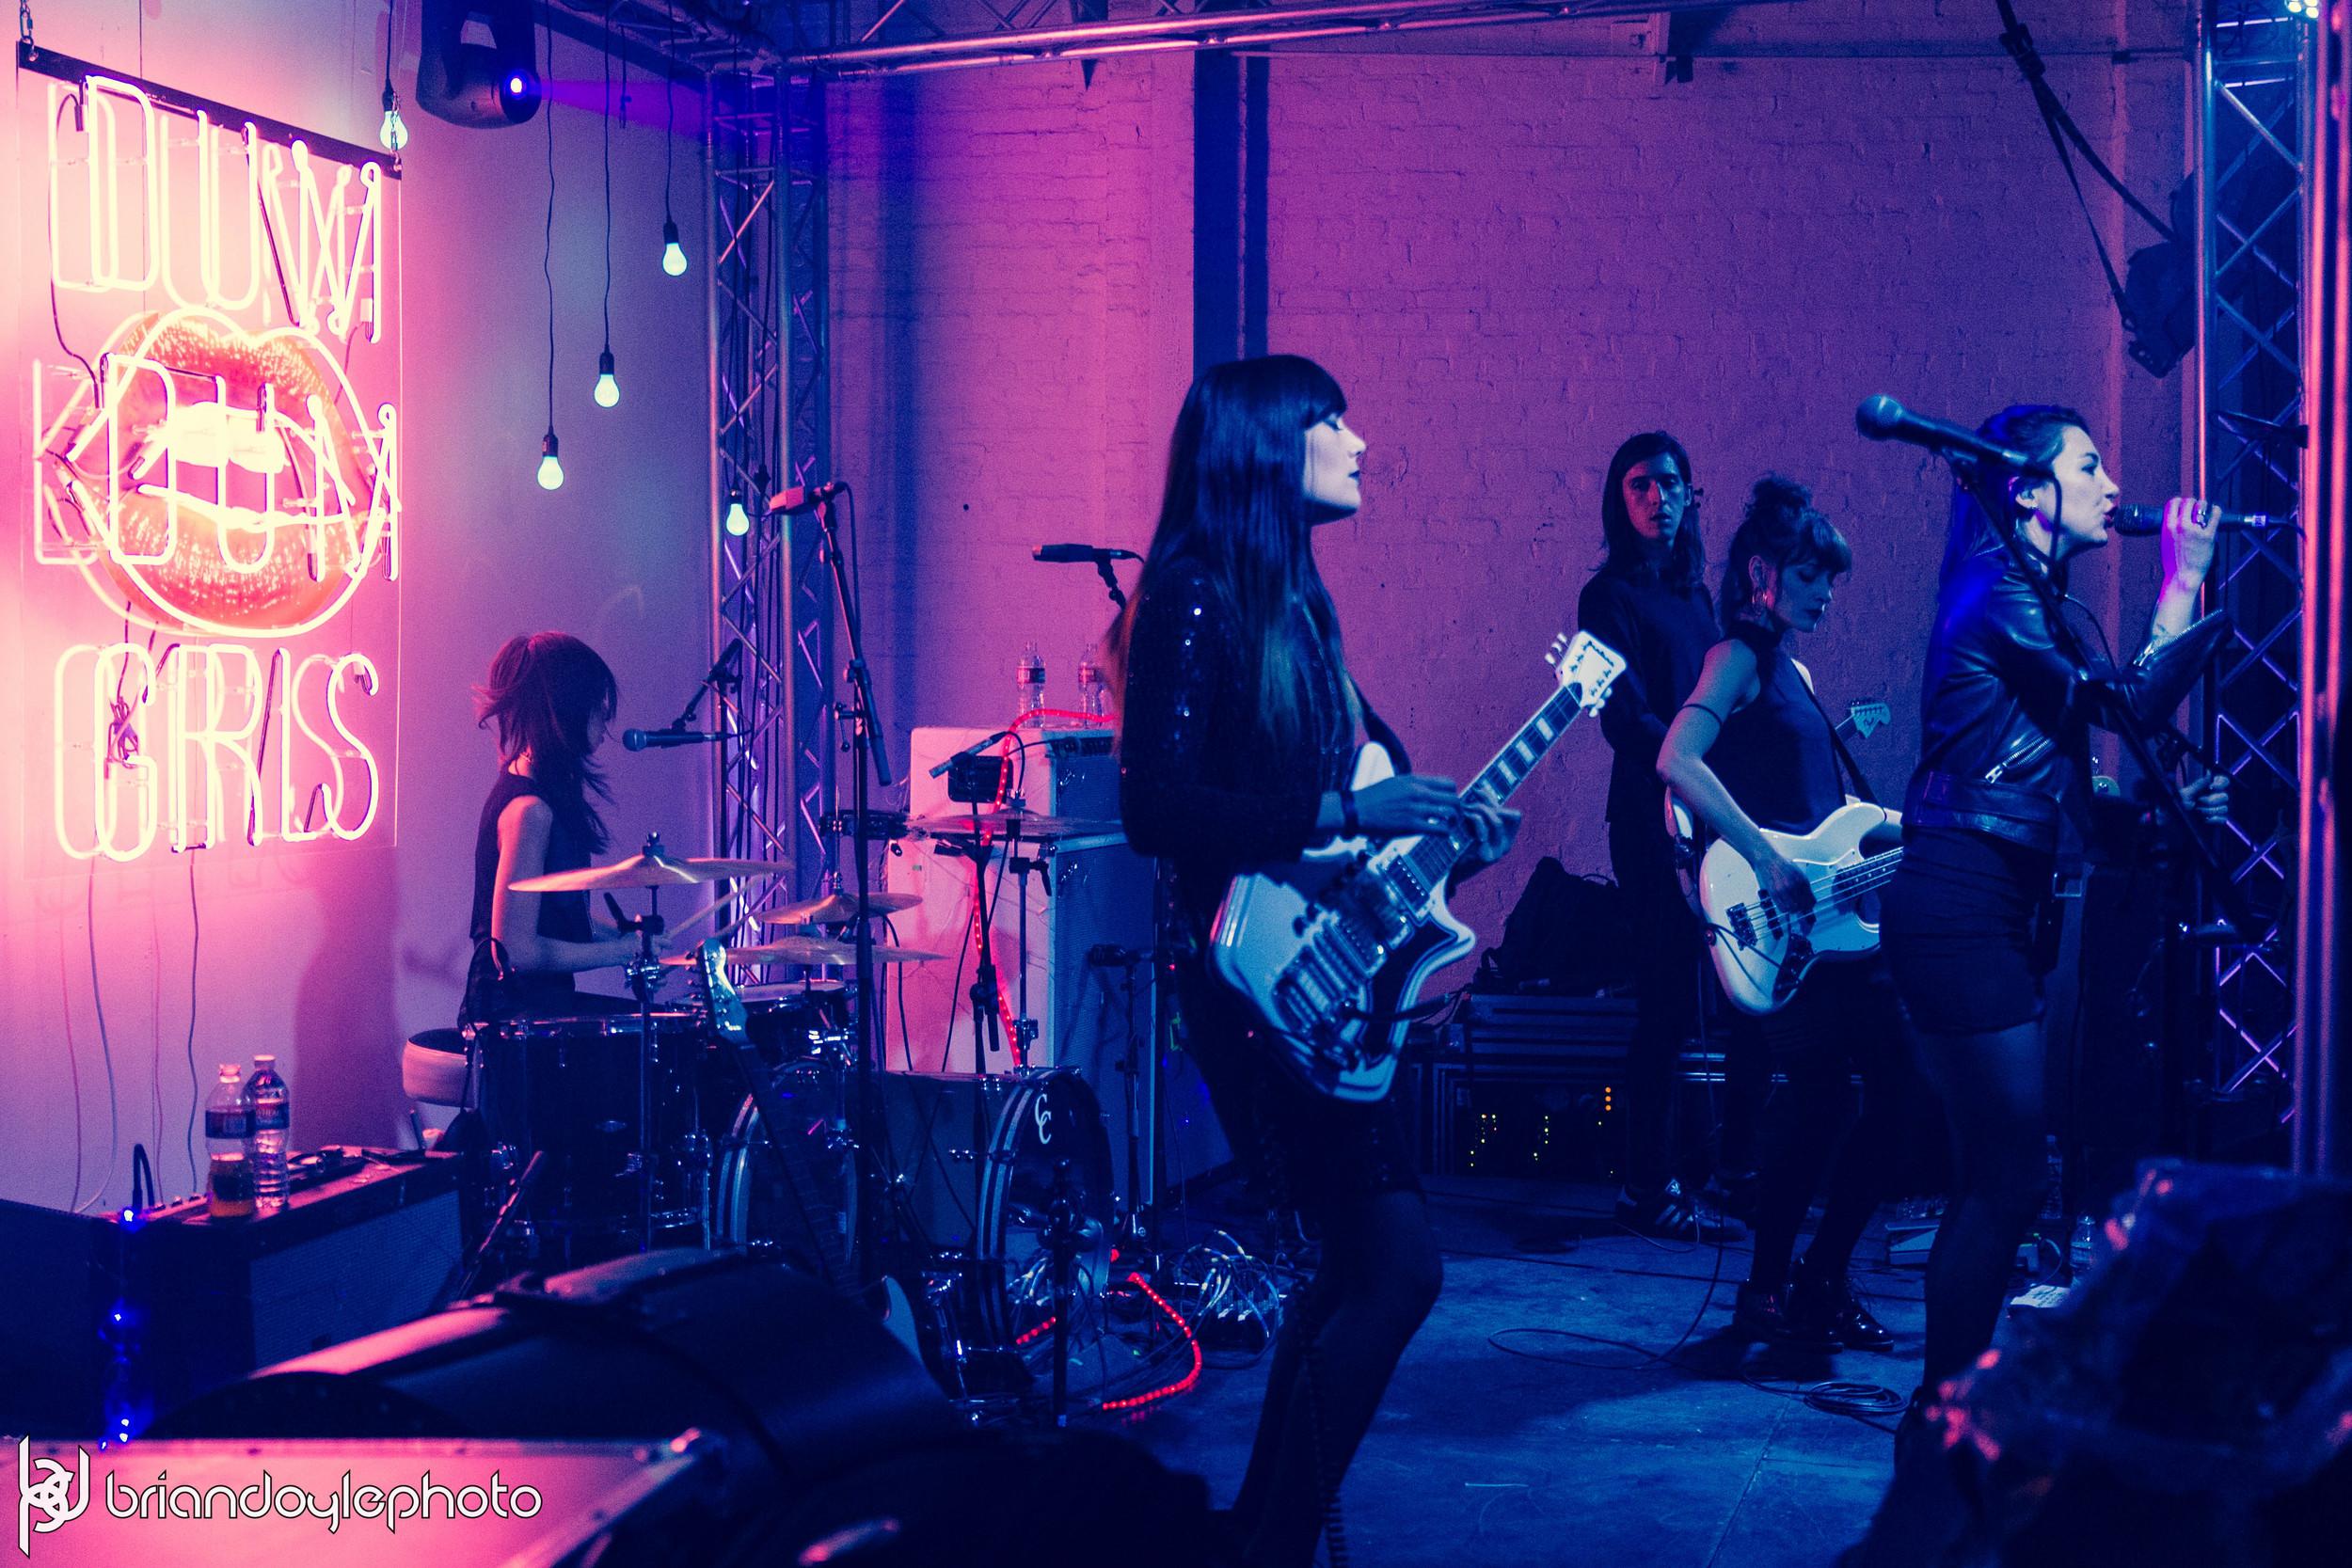 Red Bull - Dum Dum Girls, Tropicana and the Flea, Lowell @ The Well 2014.11.16-57.jpg